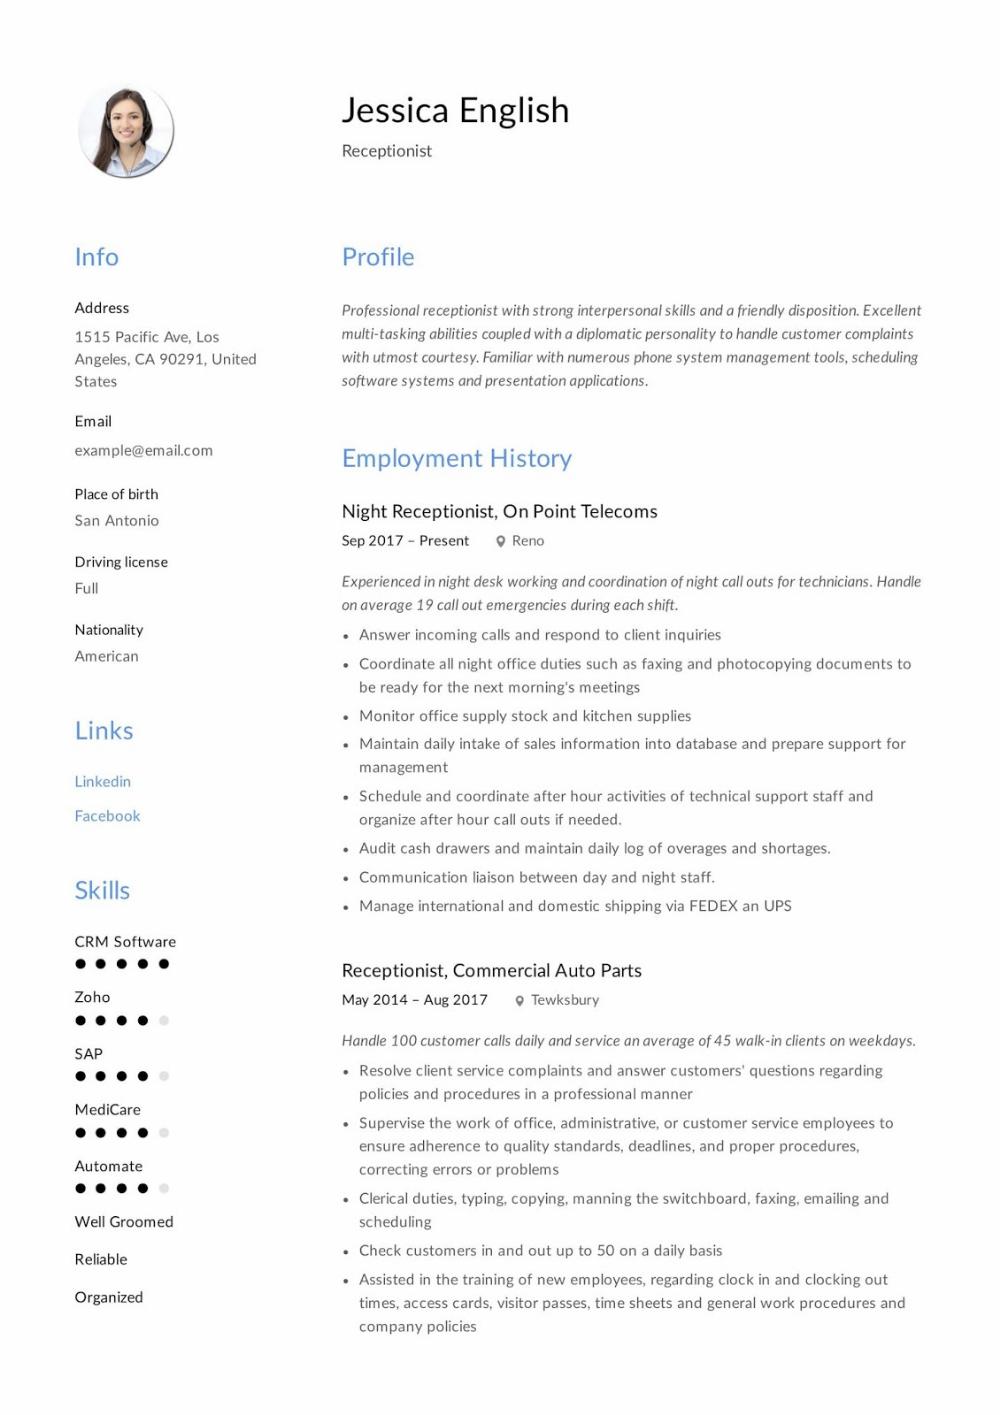 Receptionist Resume Examples 2019 Receptionist Resume Samples 2020 Receptionist Resume Examples Reception Resume Examples Resume Skills Medical Receptionist